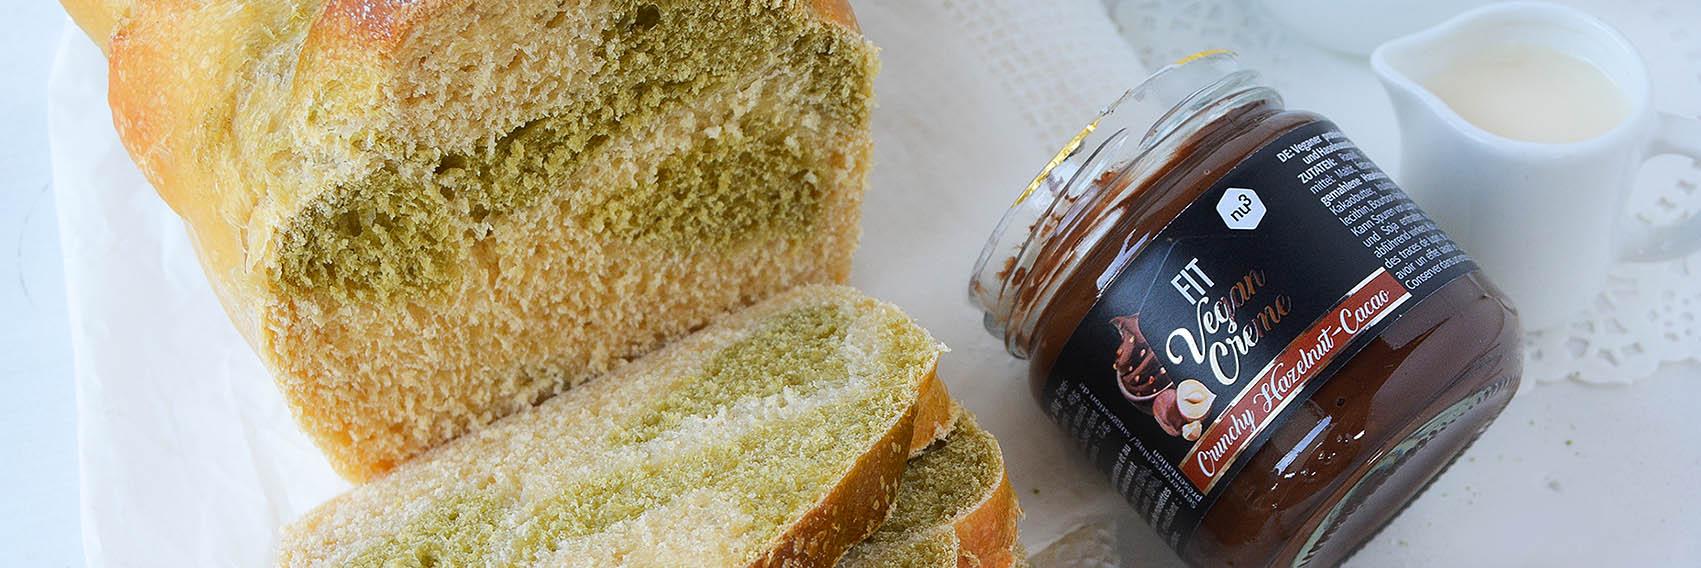 Pan brioche variegato al matcha